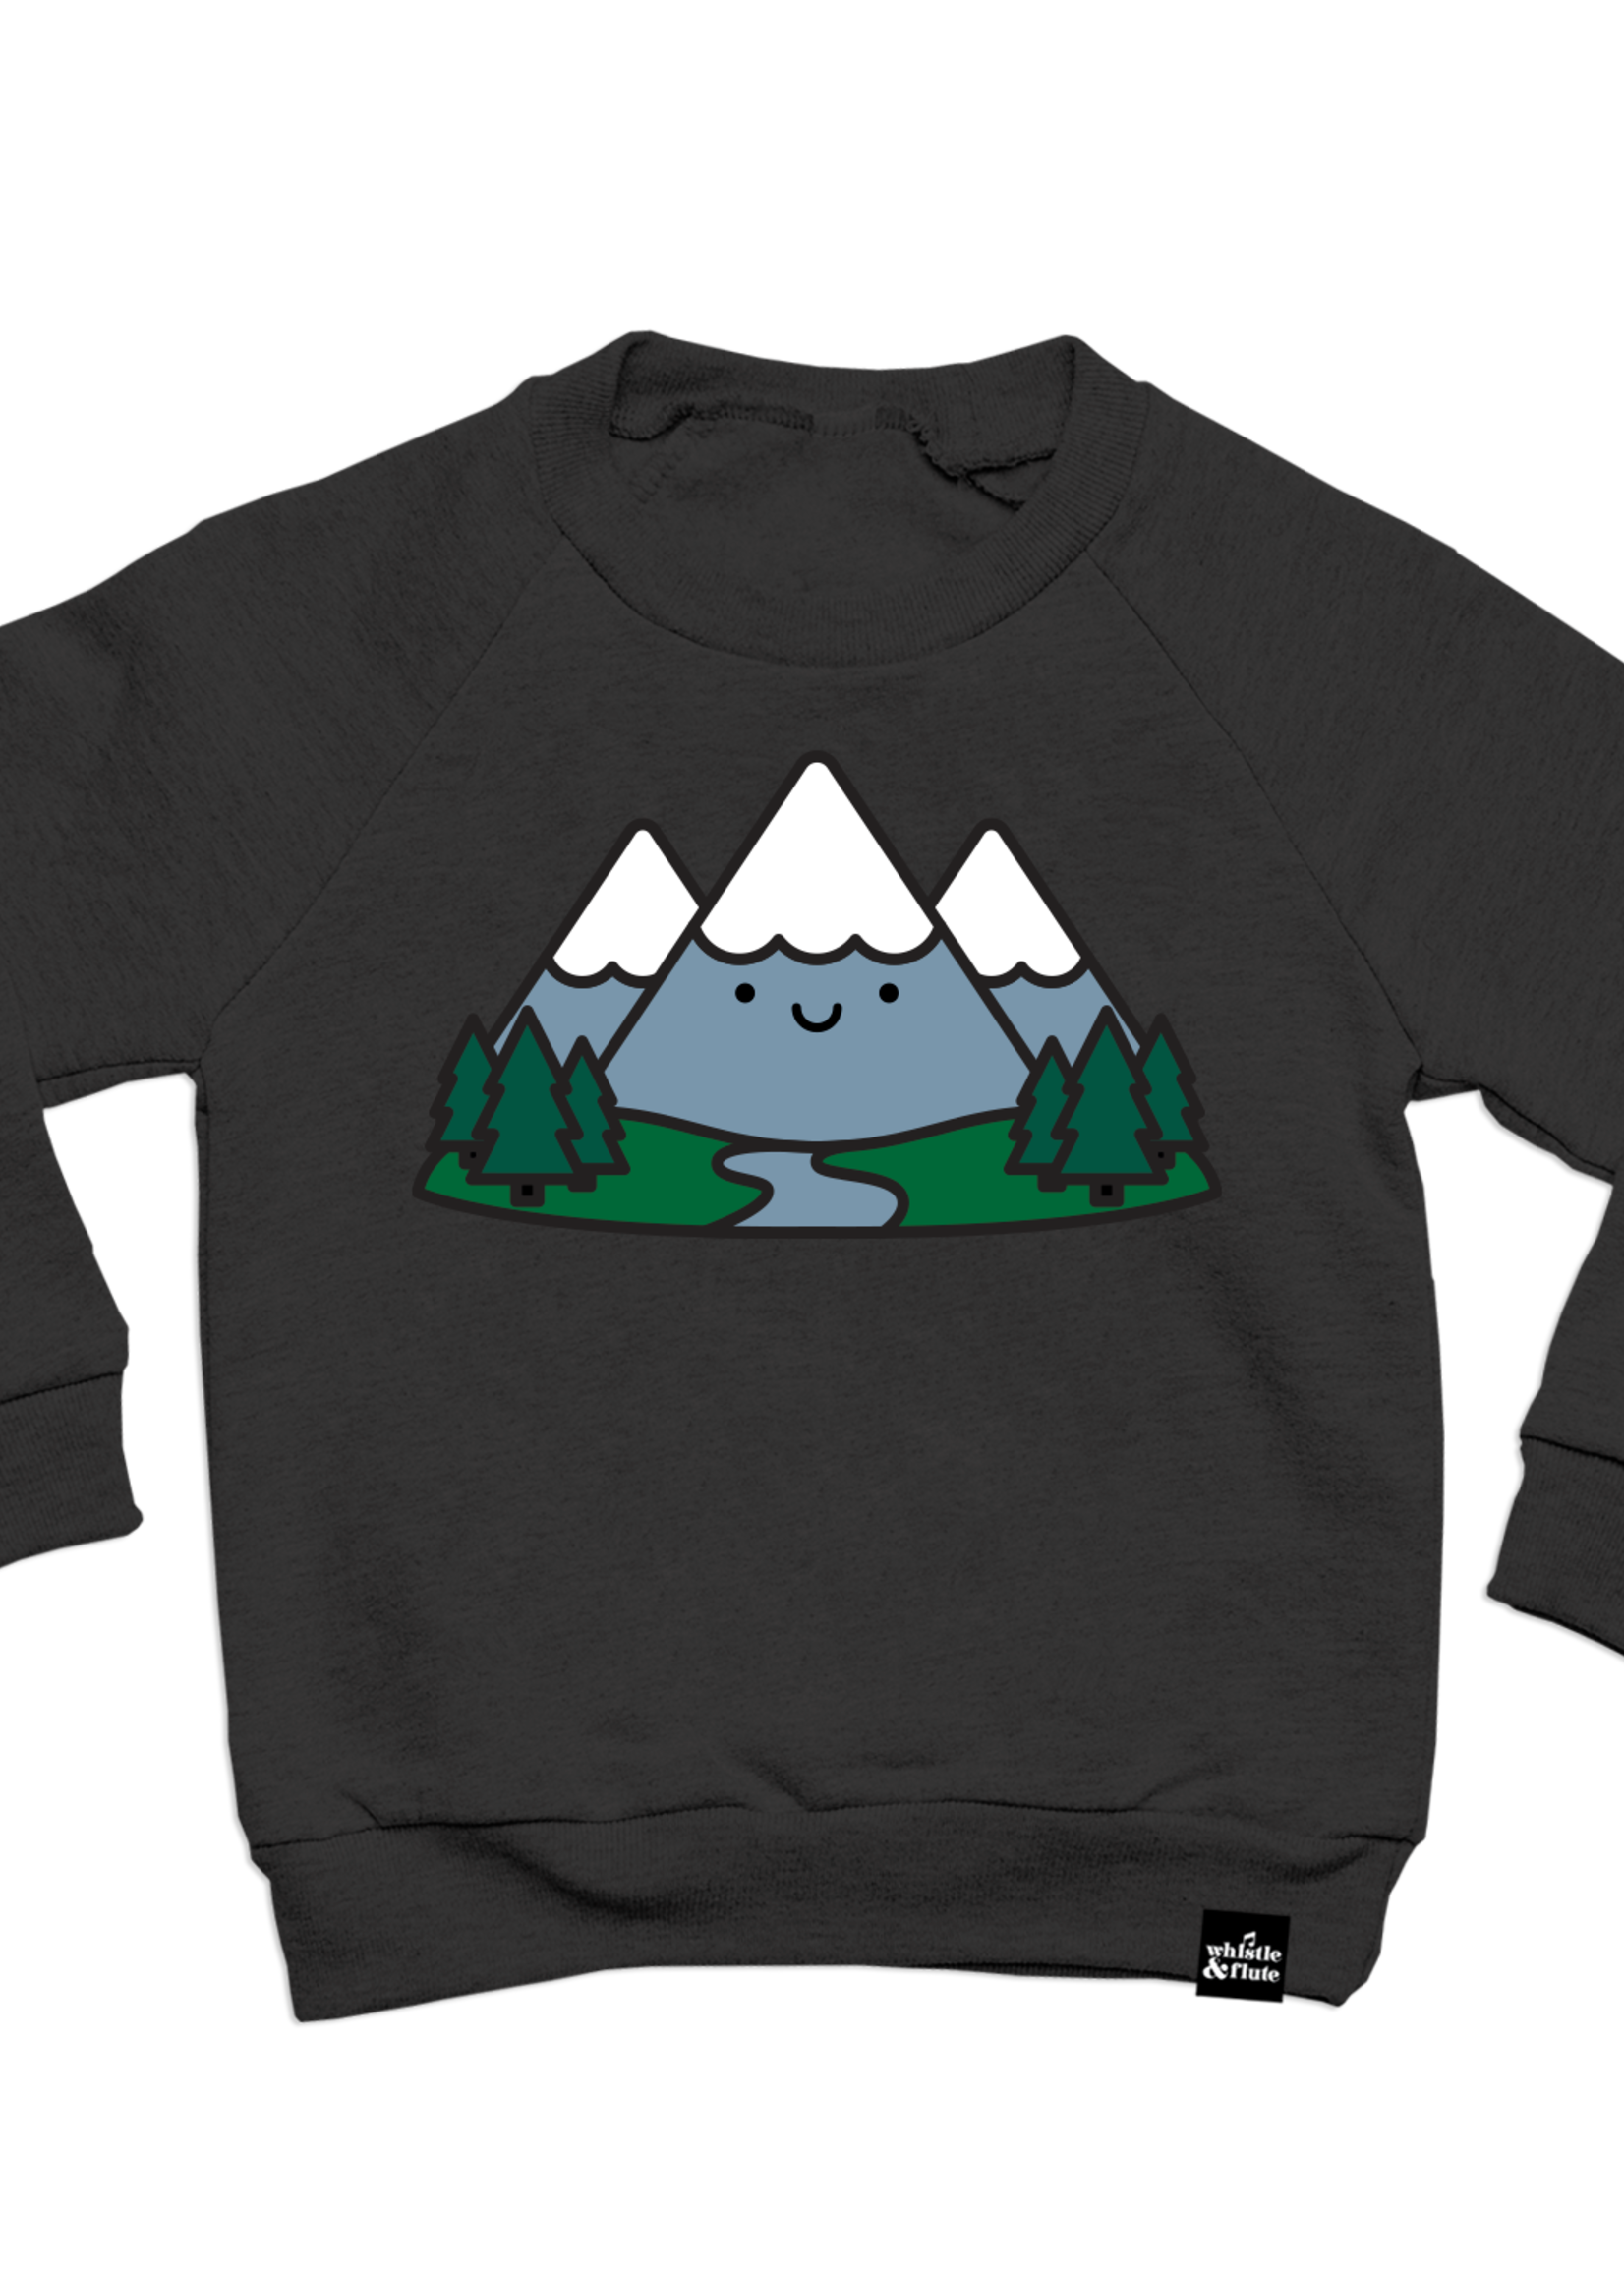 Whistle & Flute W&F Sweater (Kawaii Mountain)